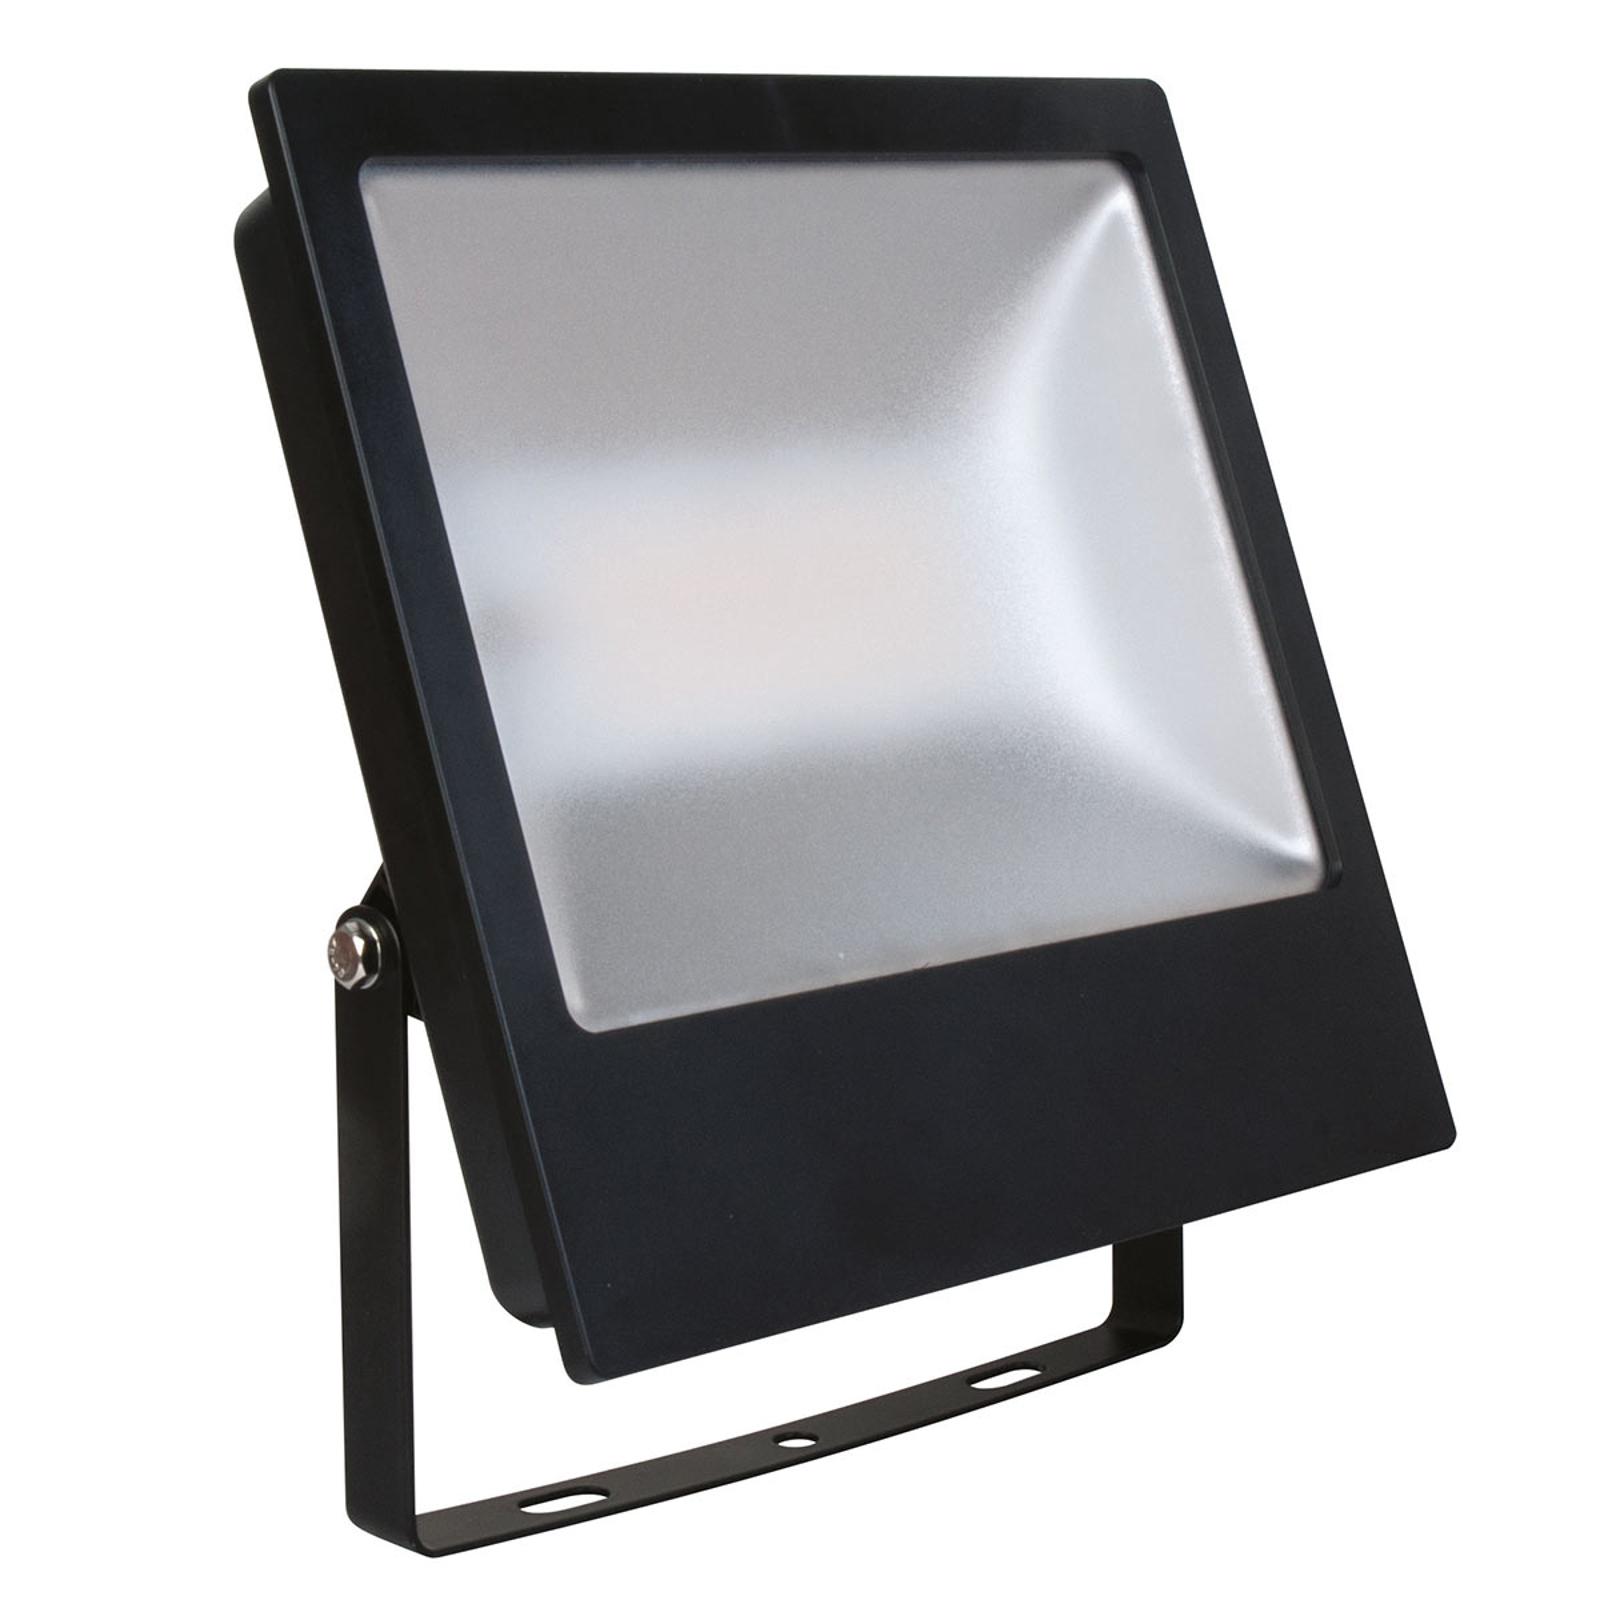 LED-buitenspot Tott, 45 W, IP65, zeewaterbestendig